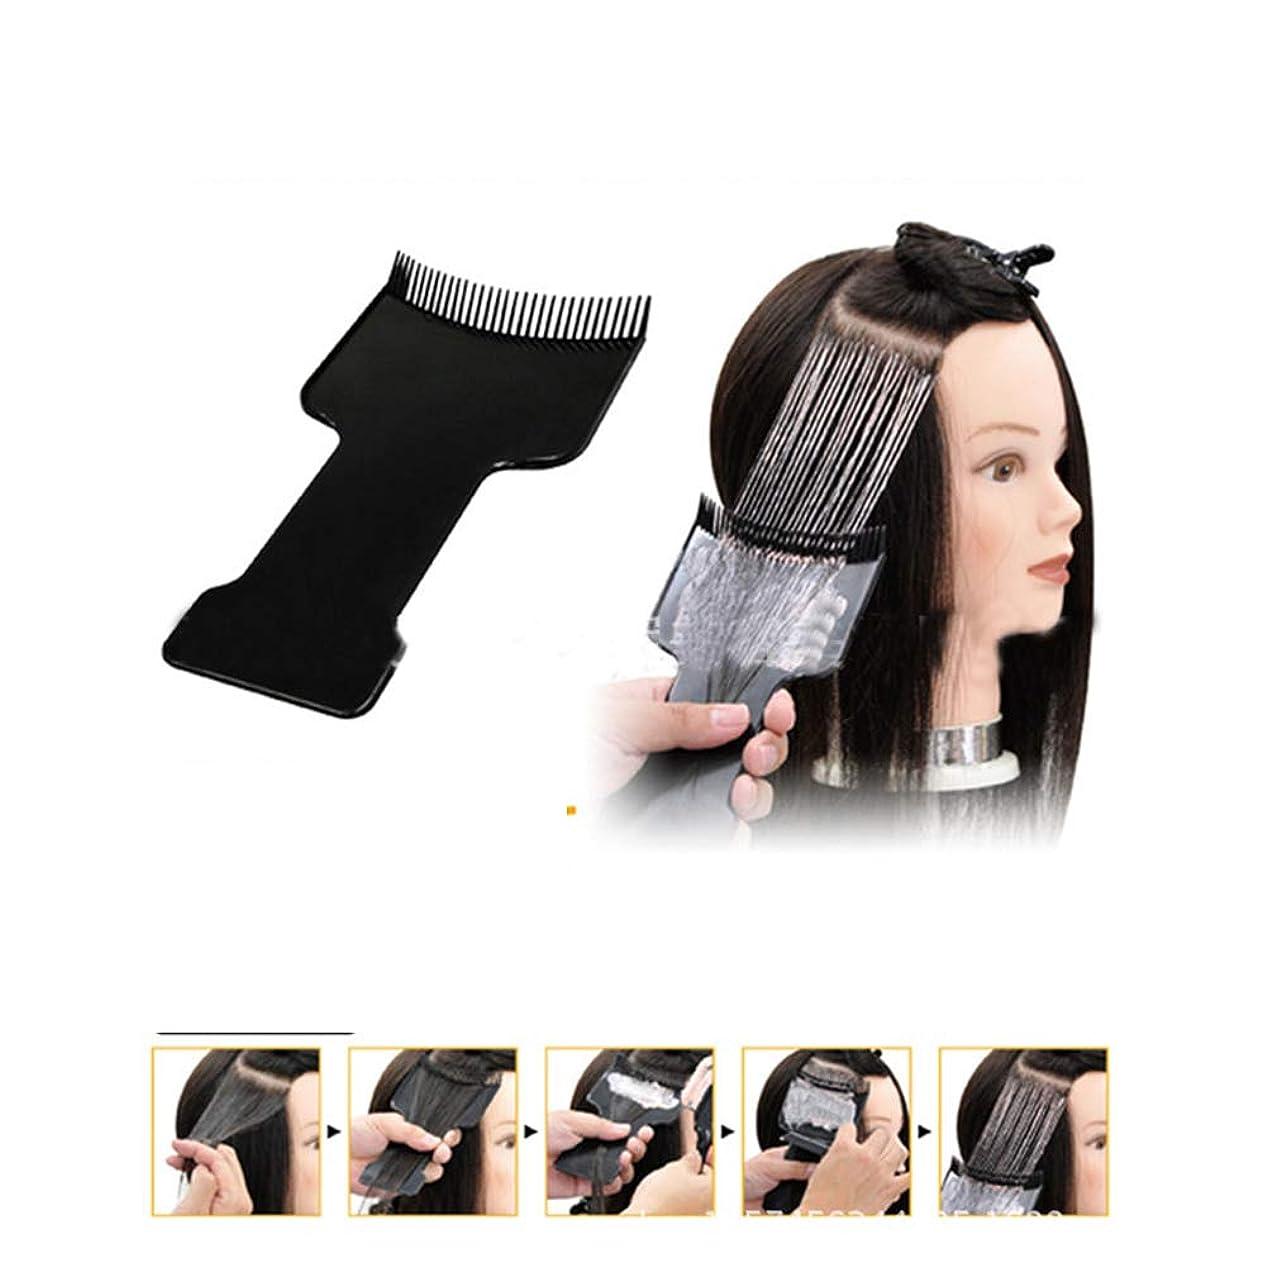 ACHICOO プロ 櫛理髪ピックカラーボードヘアダイカラーブラシサロンストリークプレートツール理髪櫛